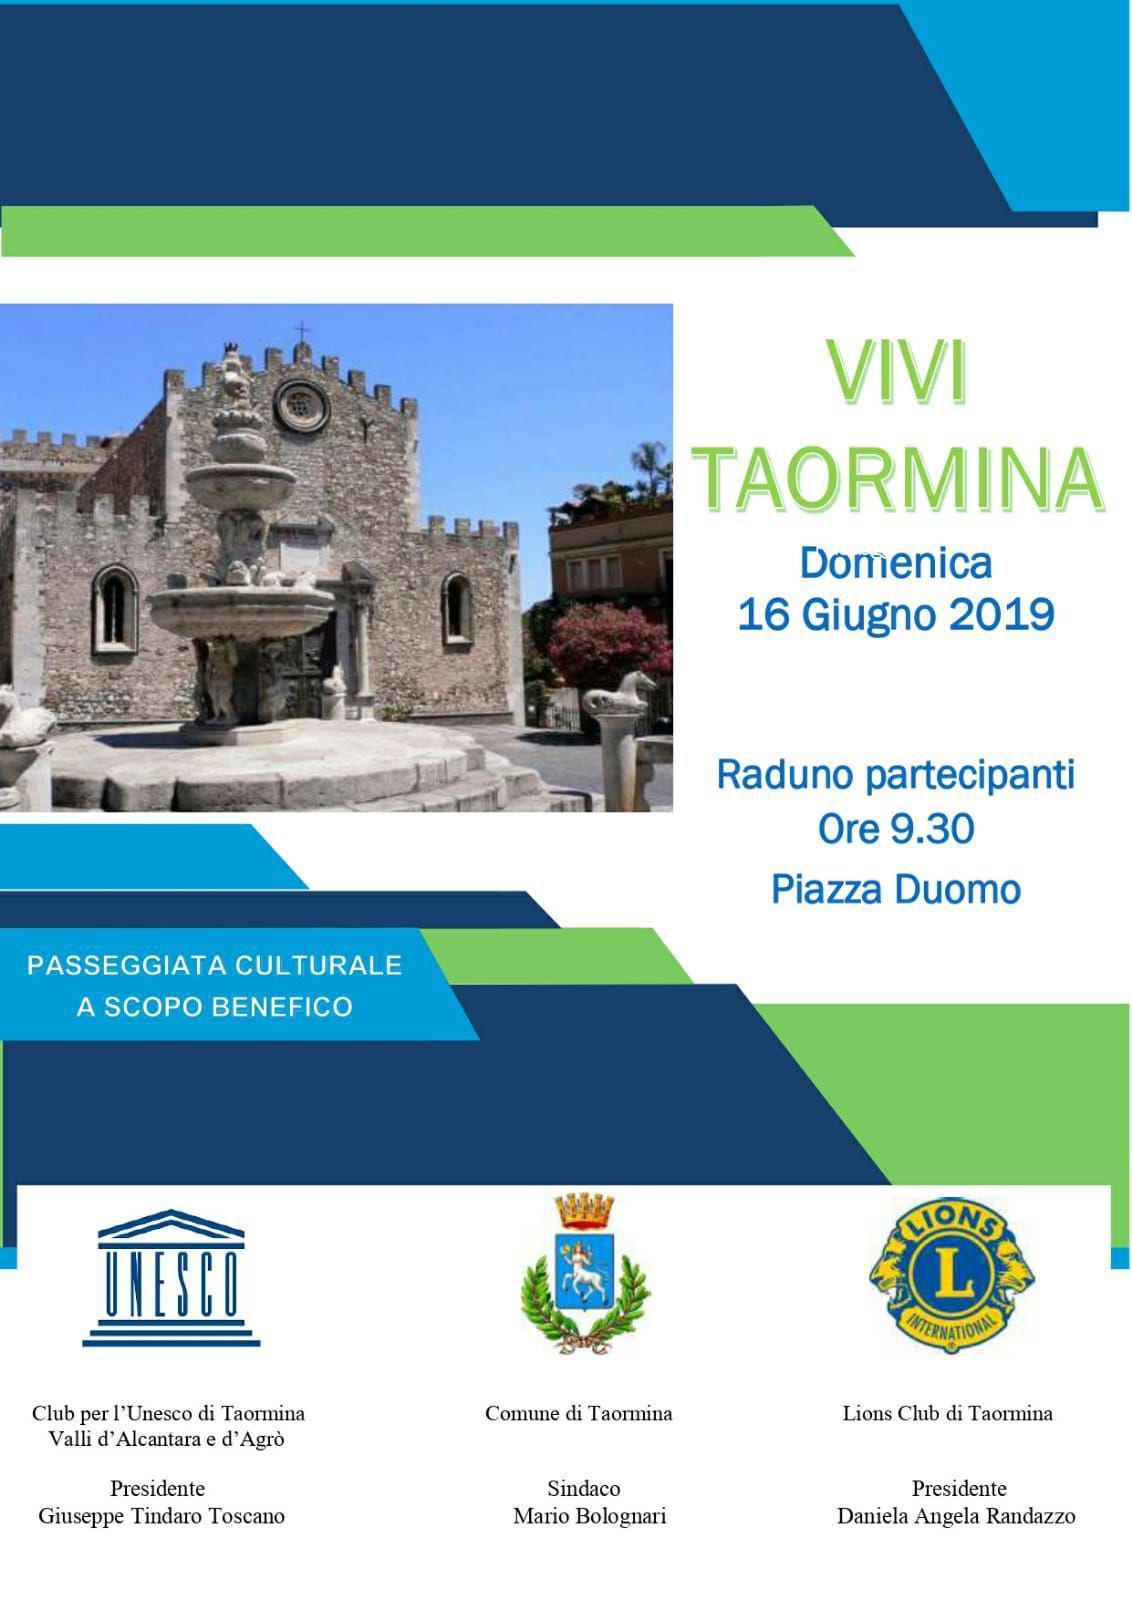 Vivi Taormina